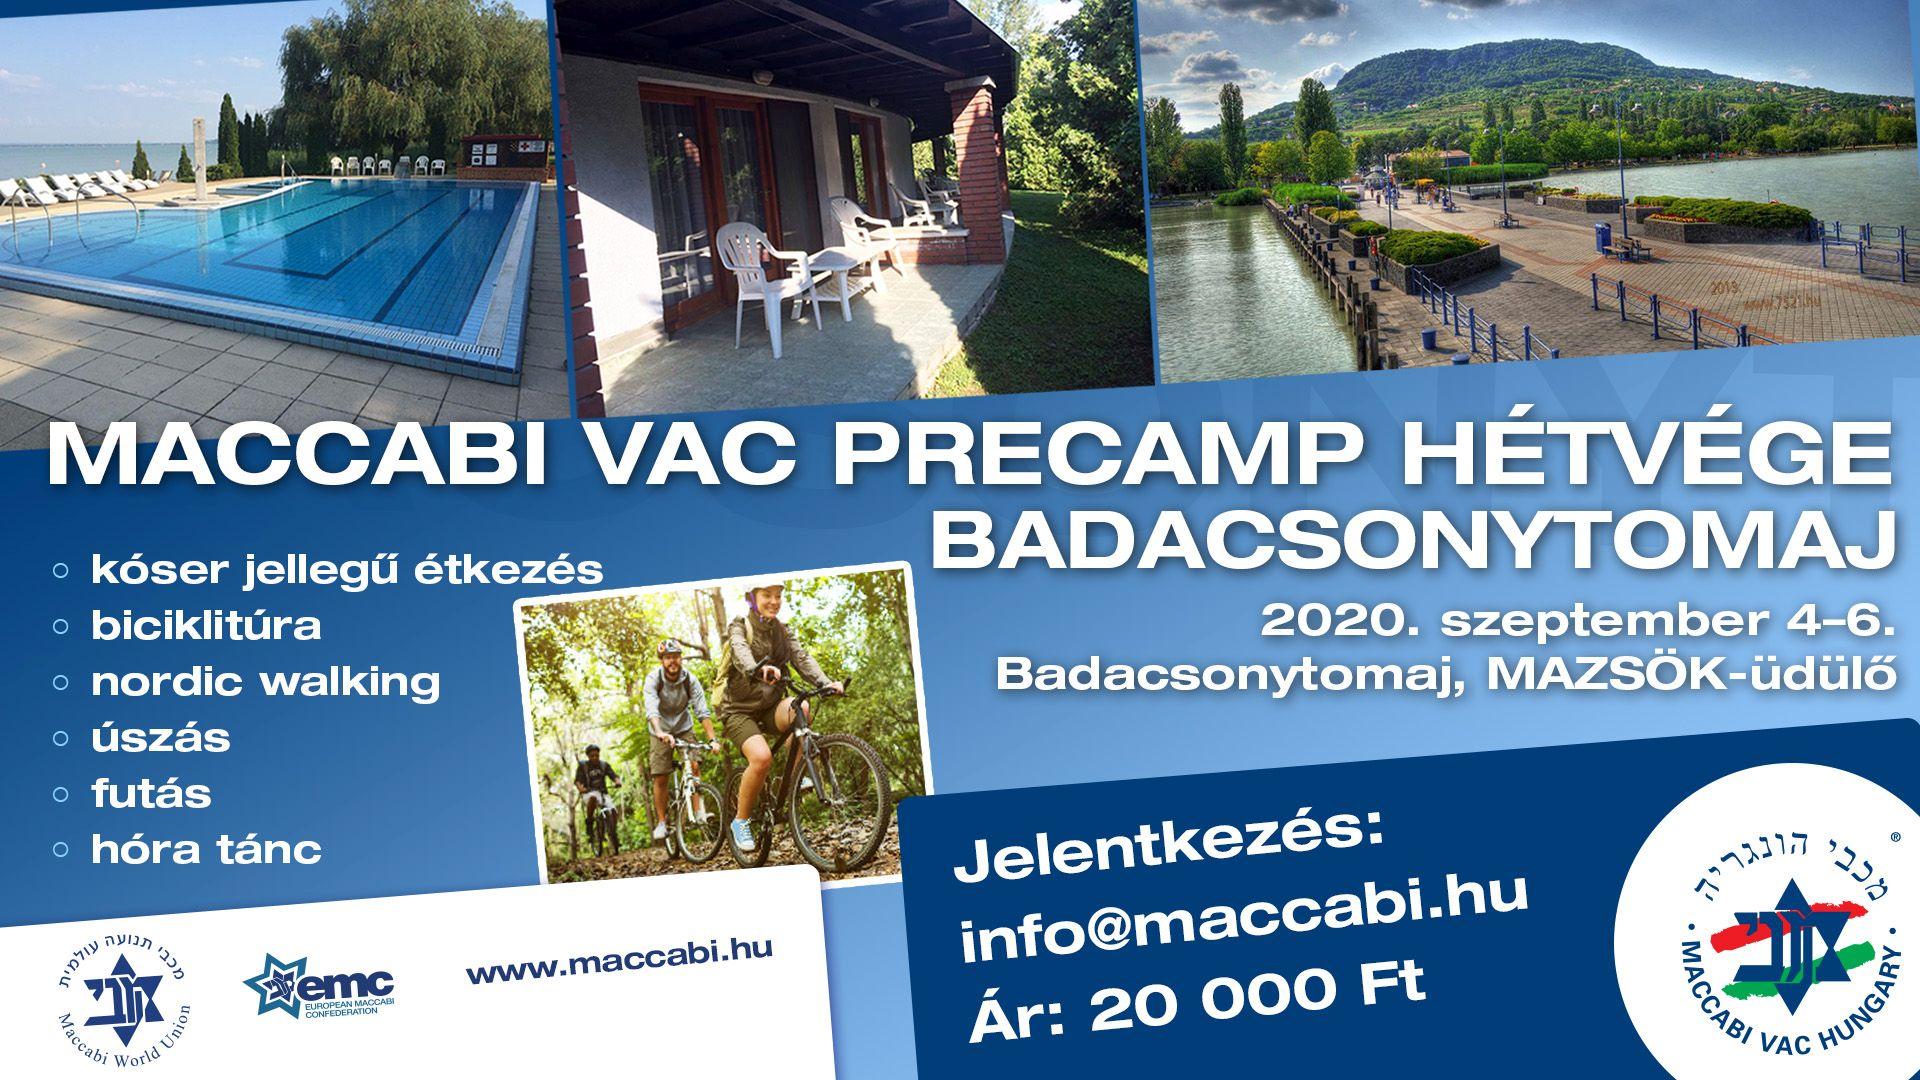 Maccabi VAC Precamp hétvége